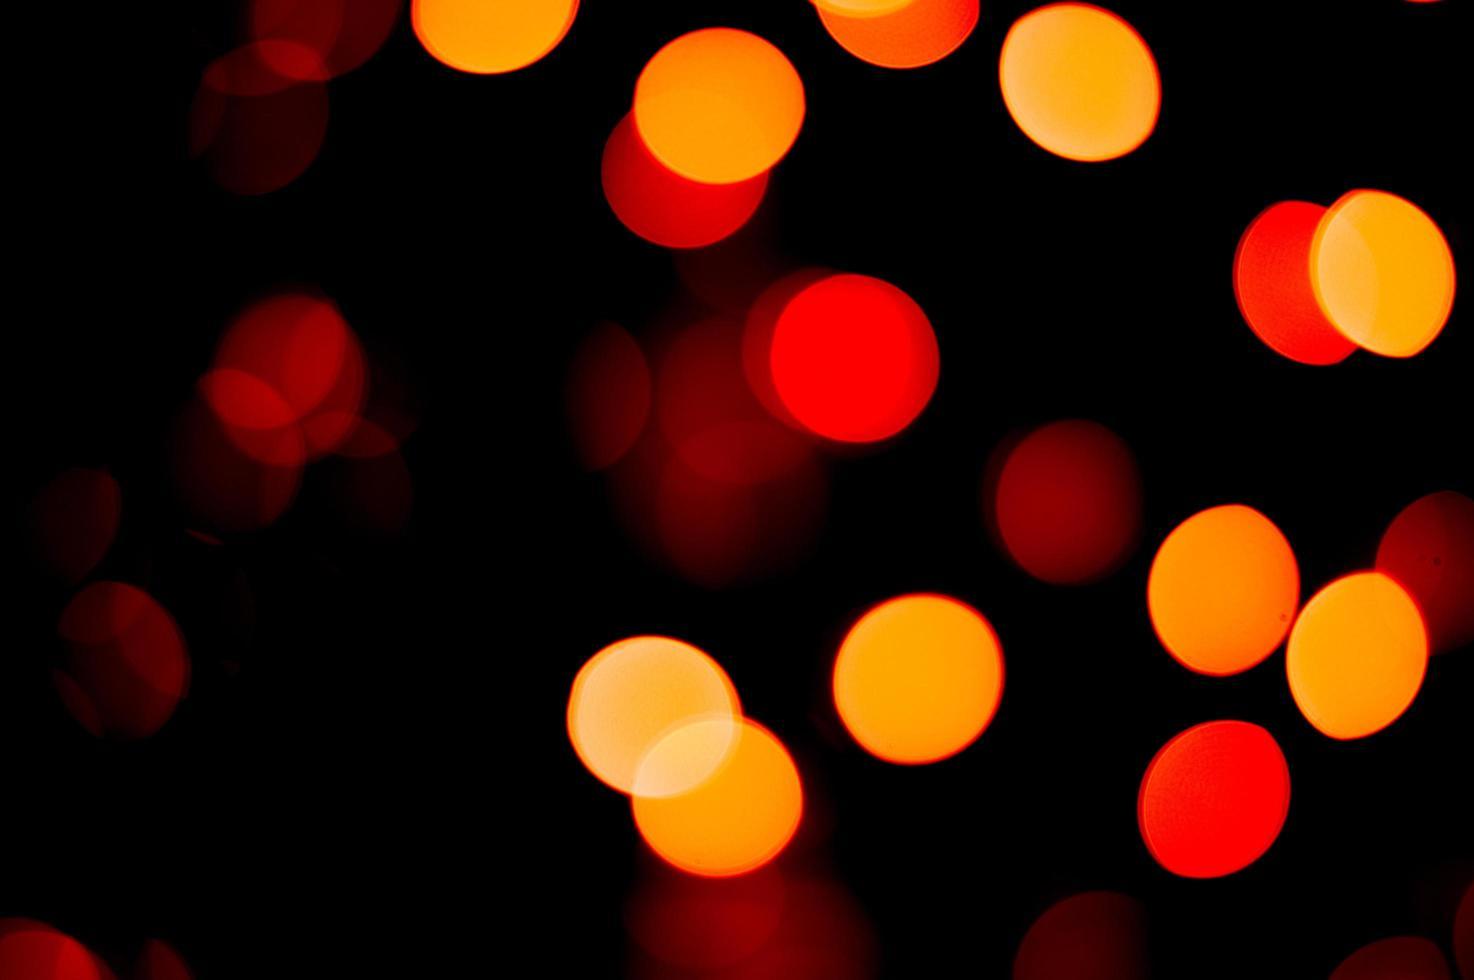 onscherp rode en gele lichten foto